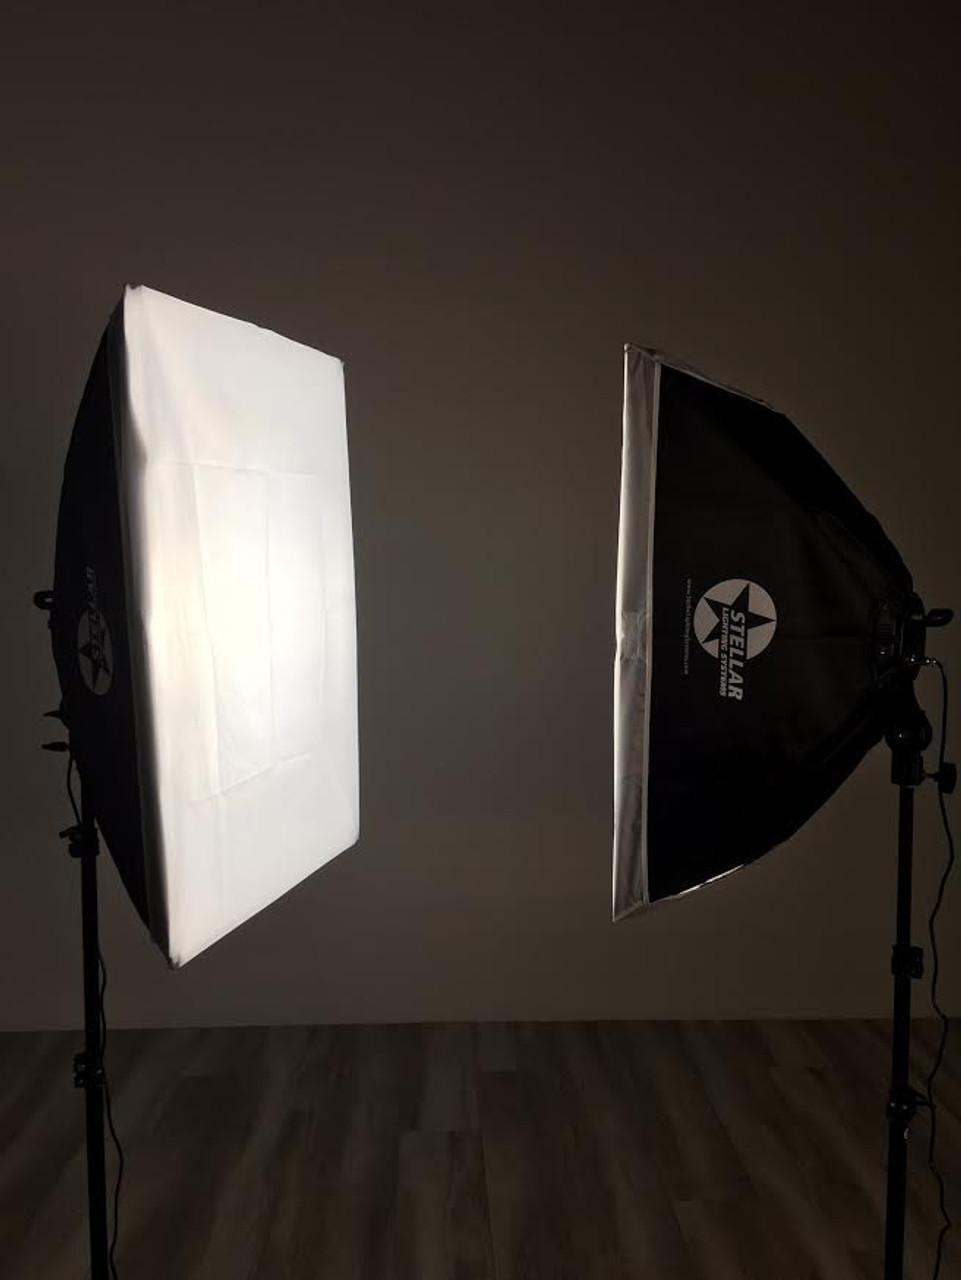 Stellar Diva II  Ring Light 18 Inch+Stellar Gemini Photo/Video Kit